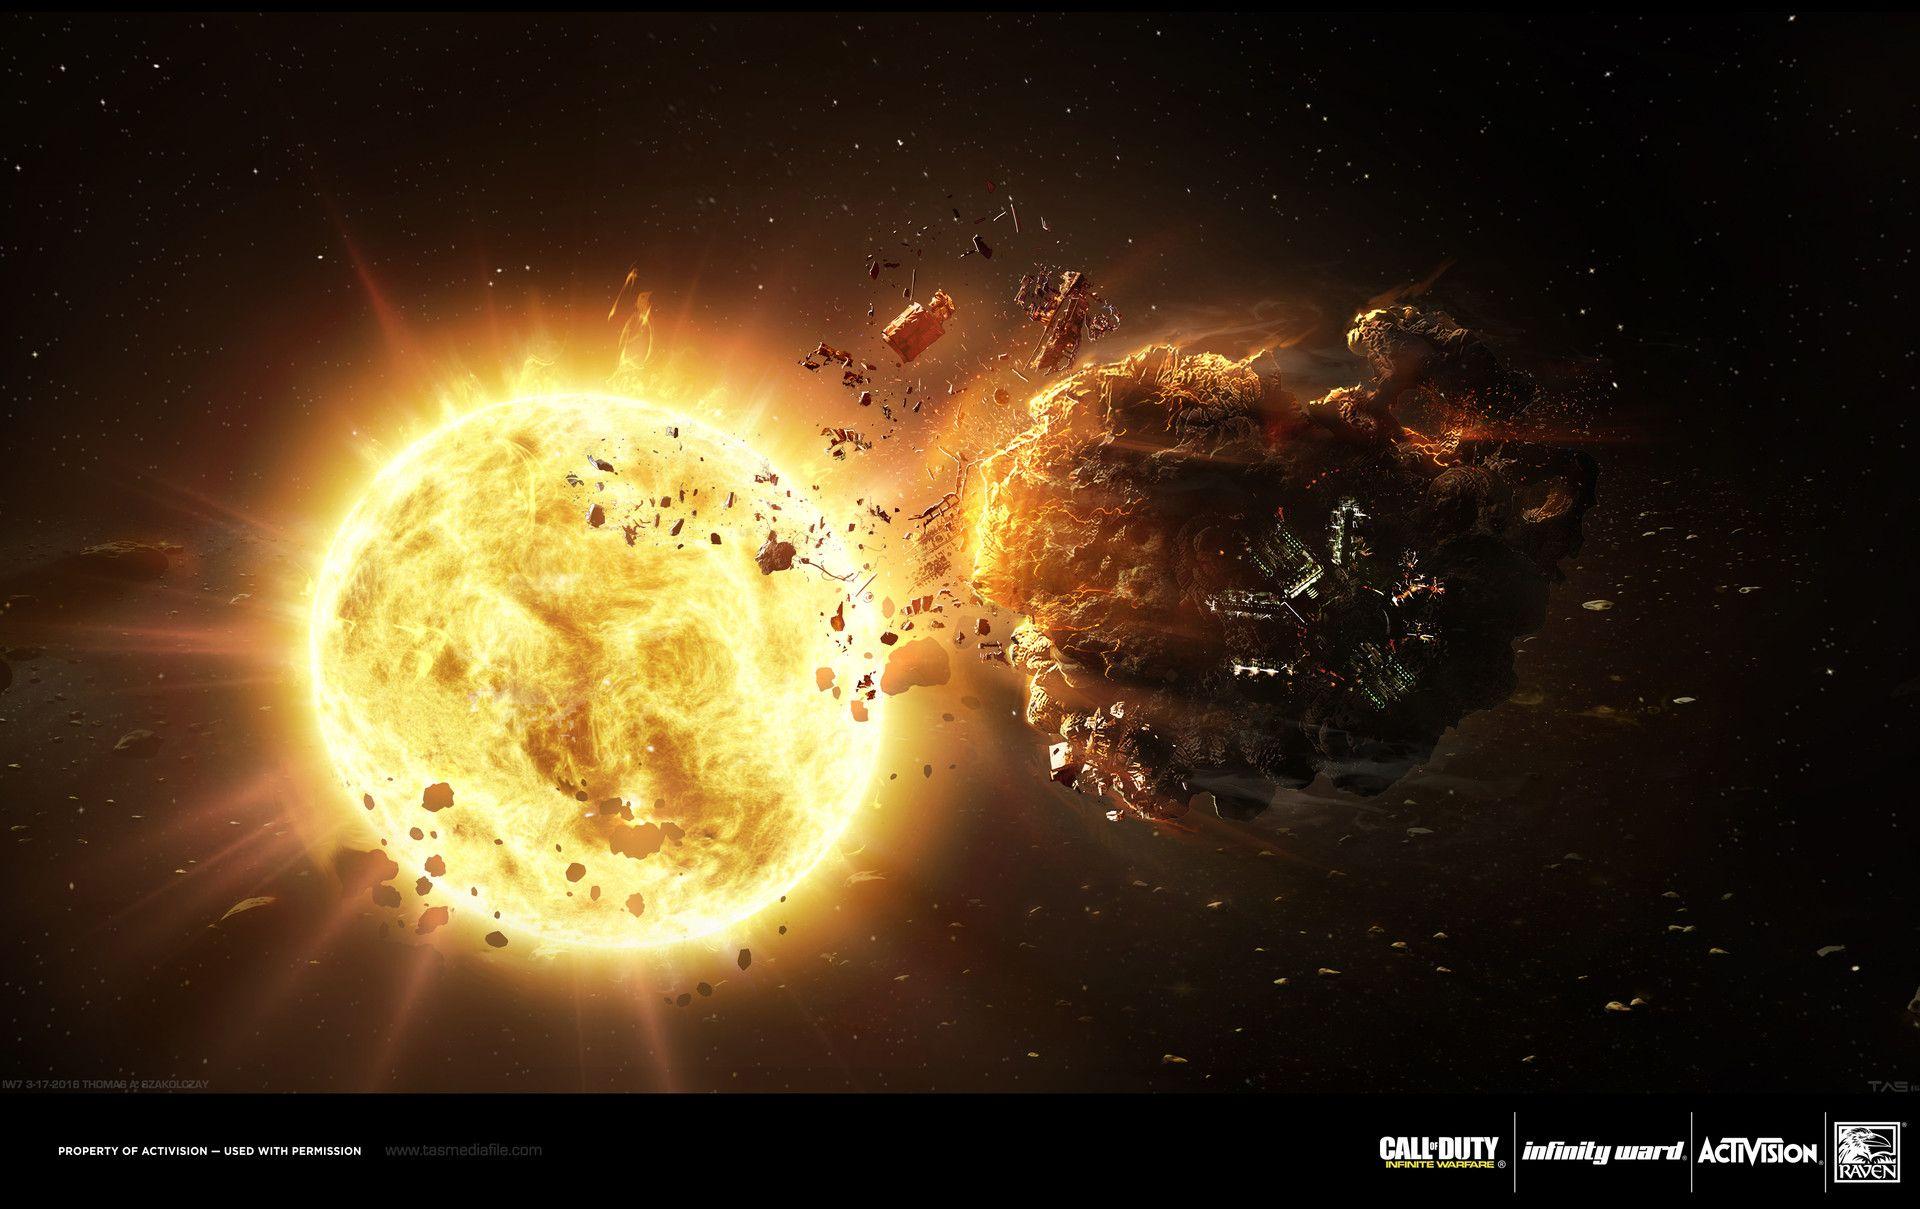 ArtStation - Space Concepts - Call of Duty: Infinite Warfare, Thomas A. Szakolczay